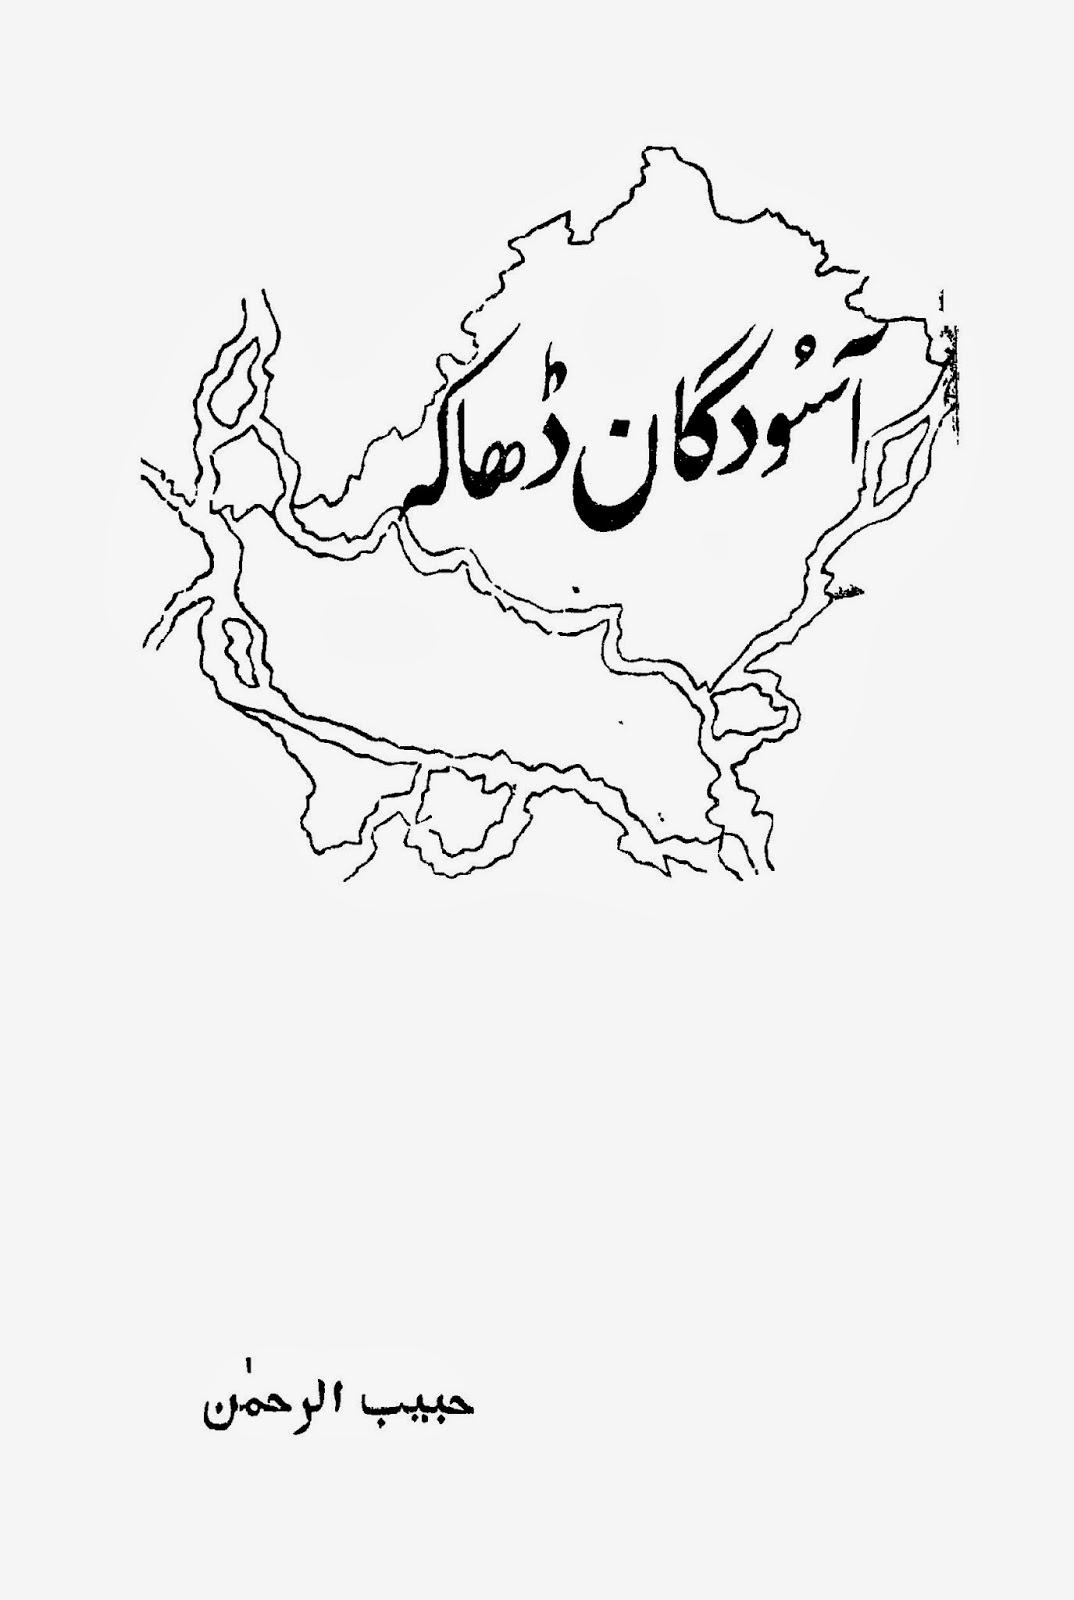 http://books.google.com.pk/books?id=89NGAgAAQBAJ&lpg=PA1&pg=PA1#v=onepage&q&f=false